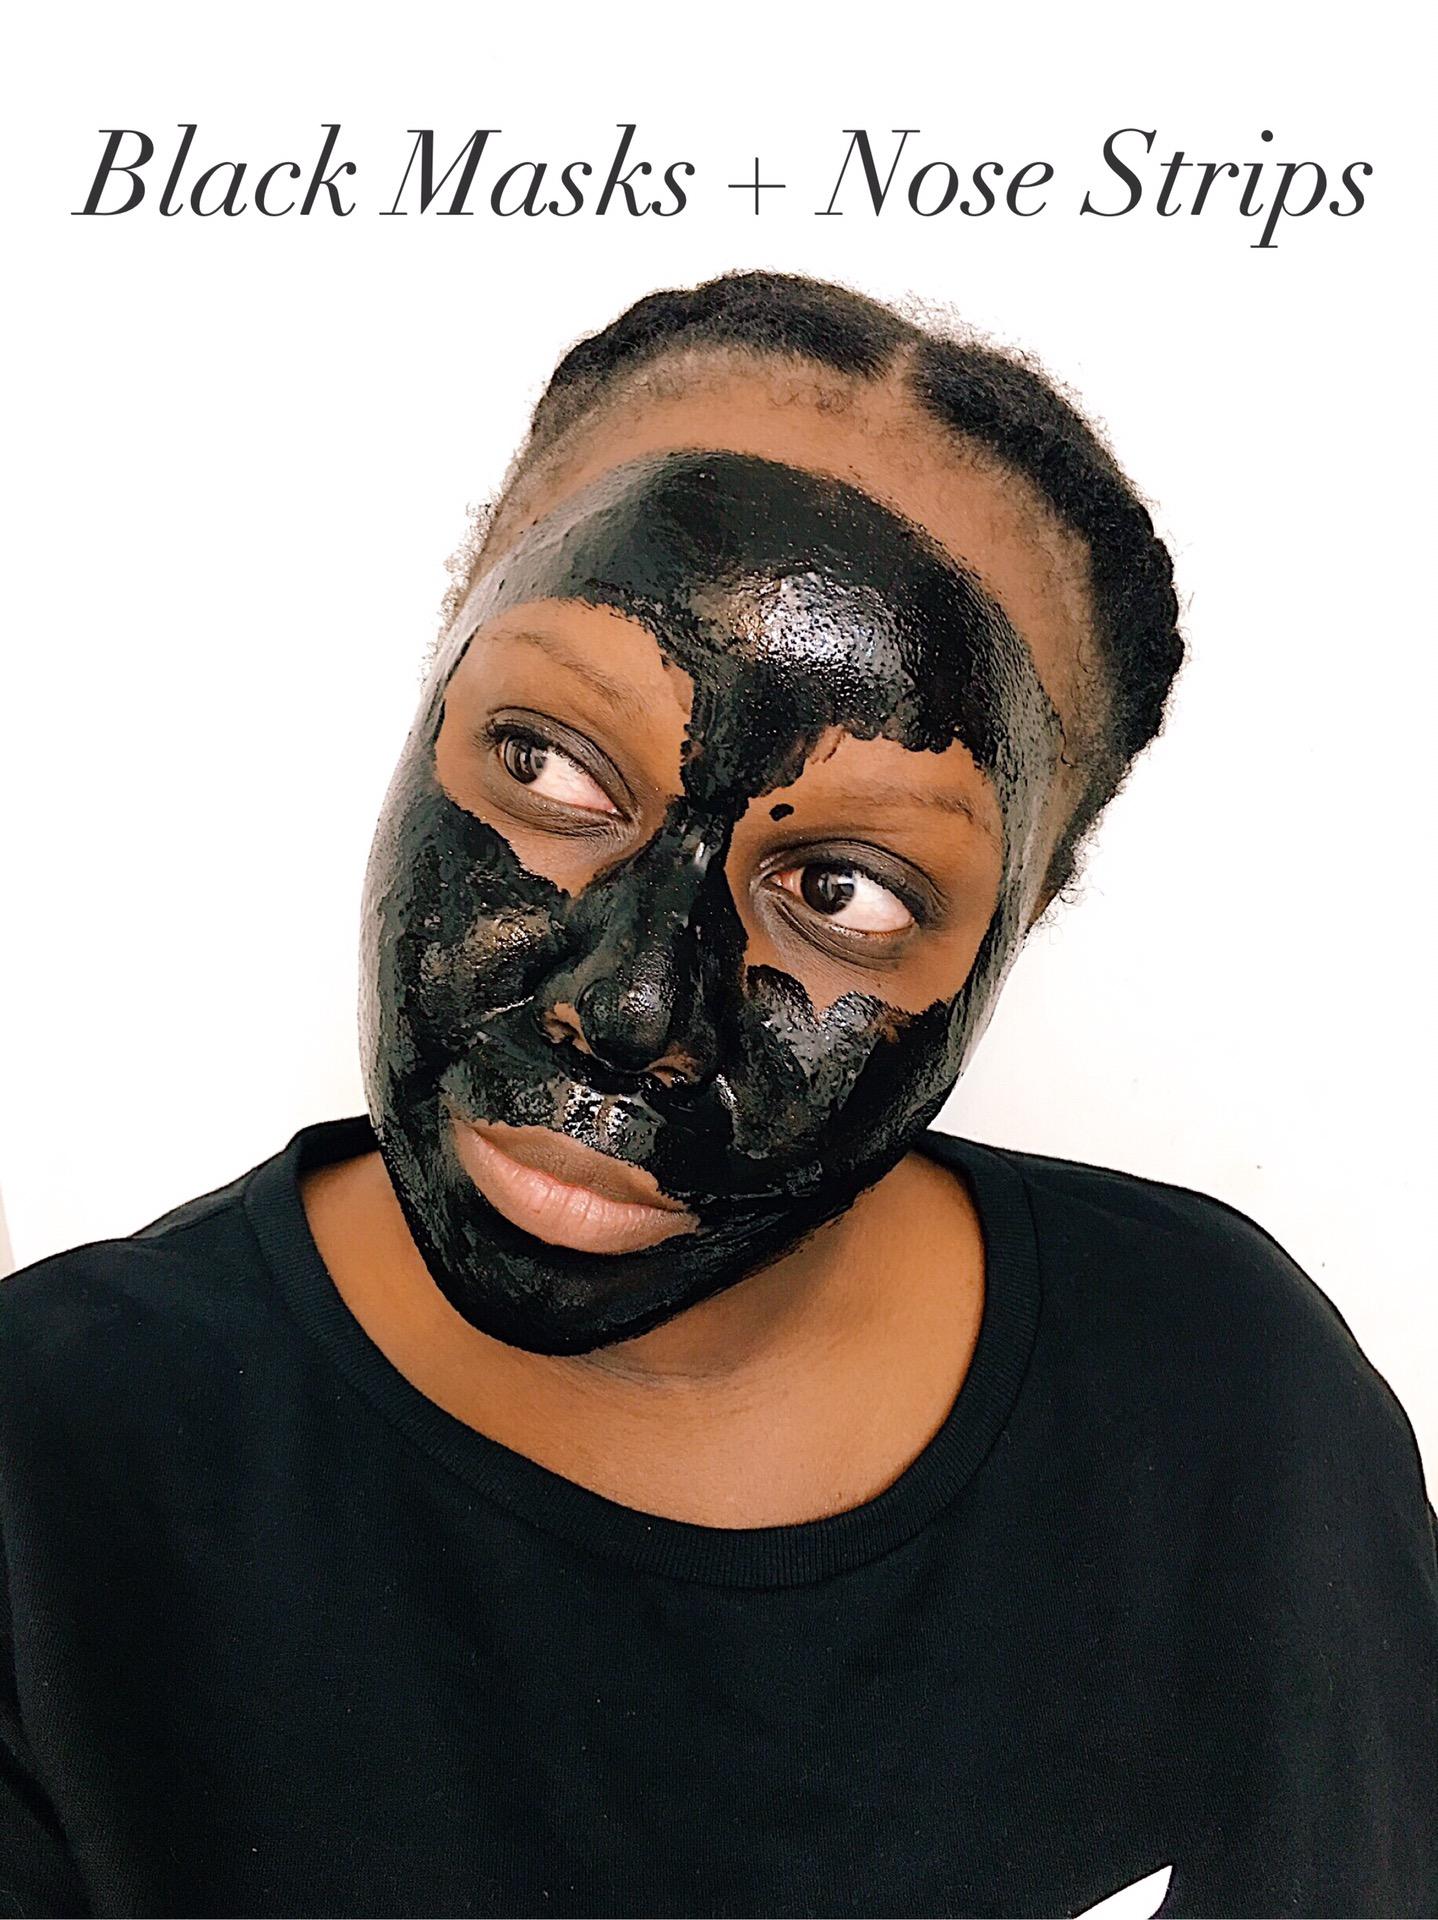 boscia Luminizing Black Mask, BIORÉ Deep Cleansing Charcoal Pore Strips